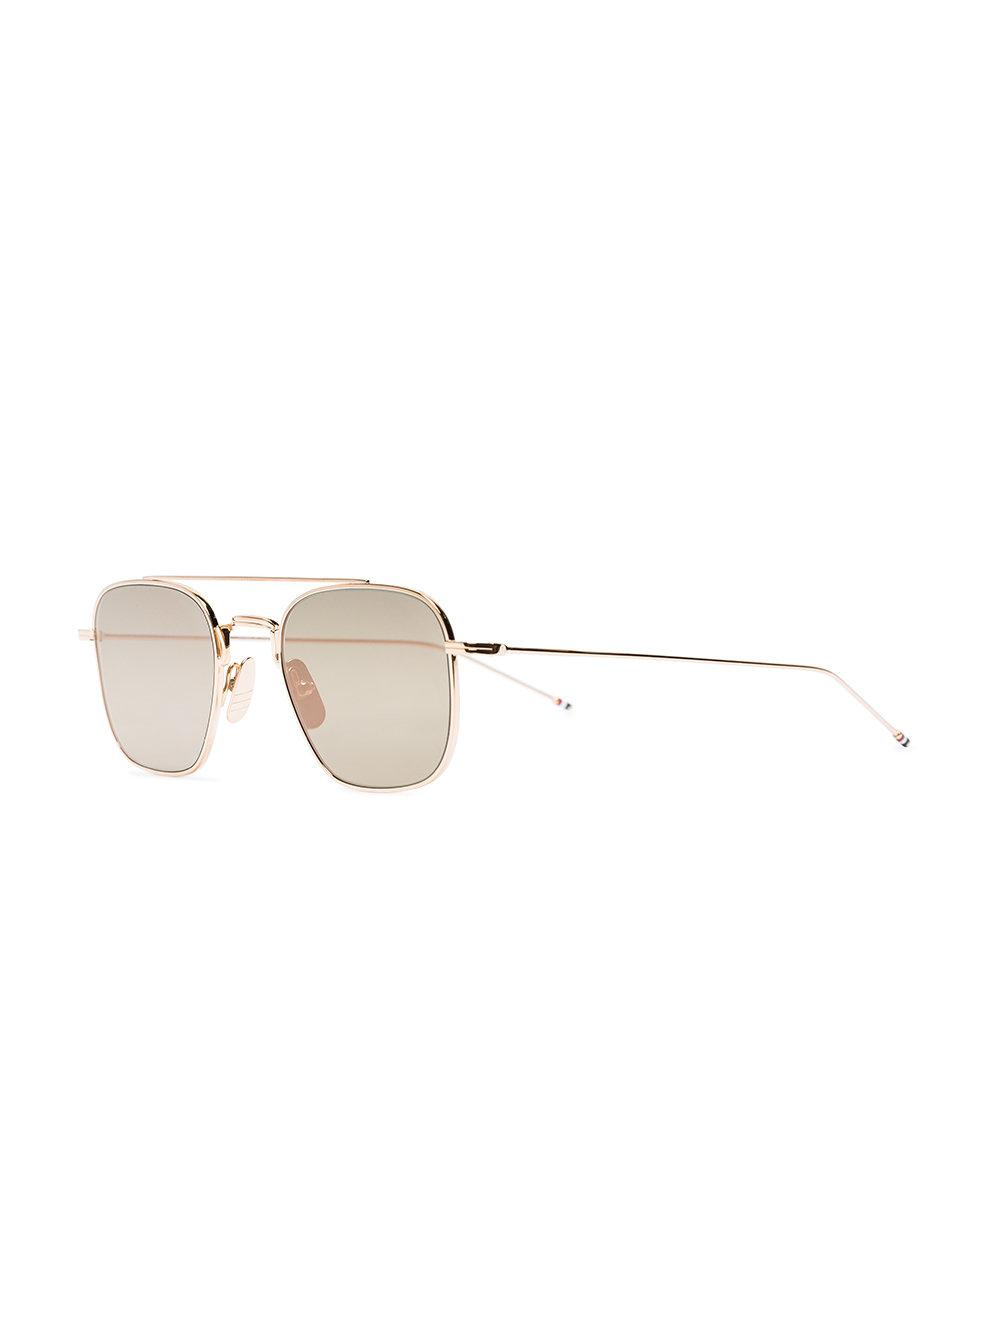 40df495ec88 Thom Browne Metallic Gold Pilot Mirror Sunglasses in Metallic for Men - Lyst